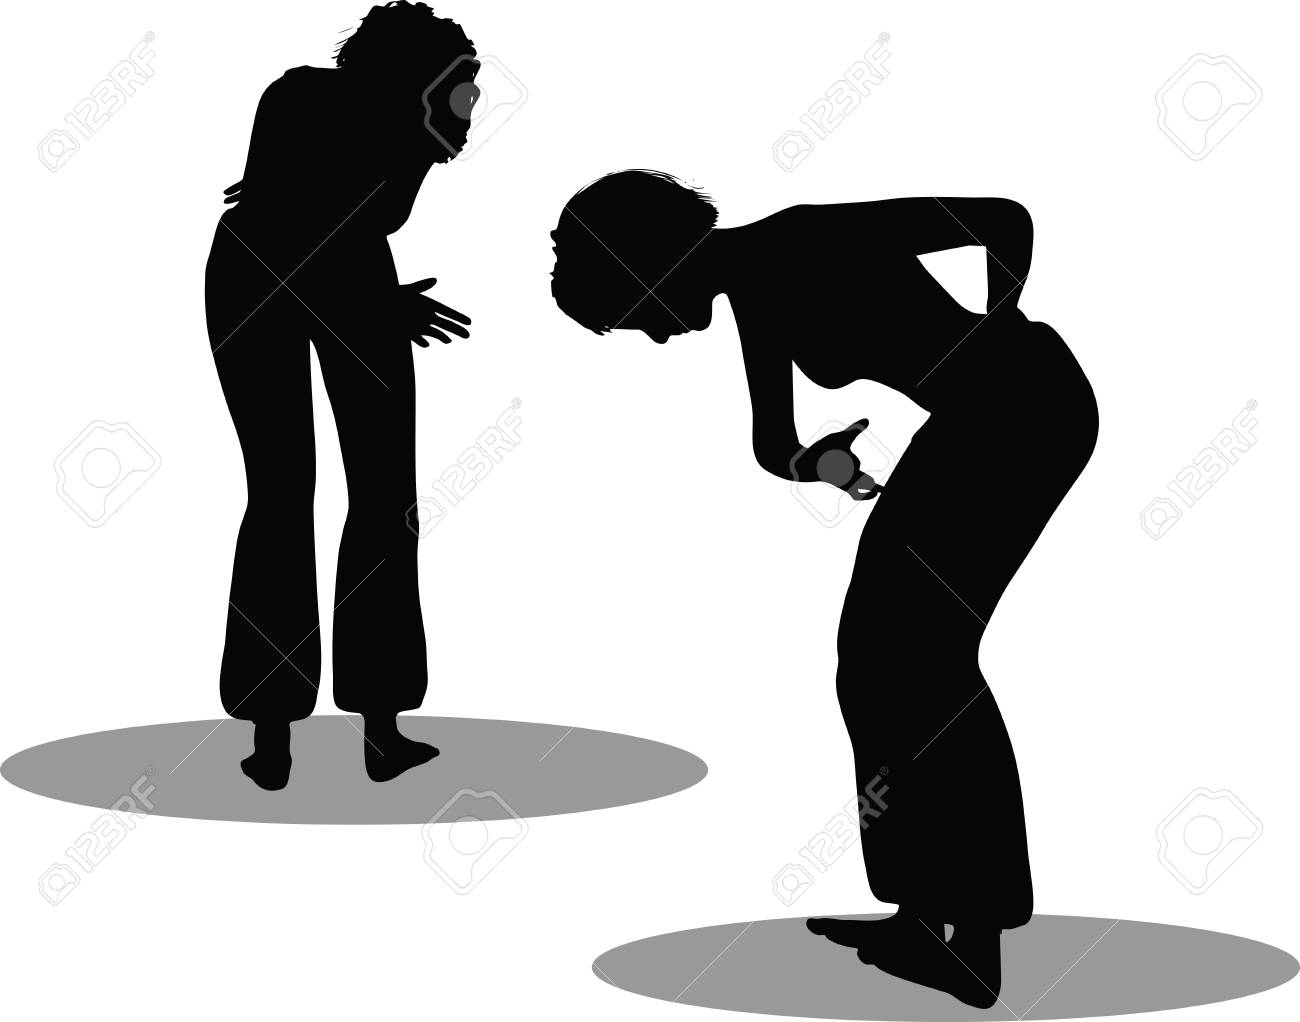 EPS 10 Vector Illustration of dancer woman silhouette Stock Vector - 27172707